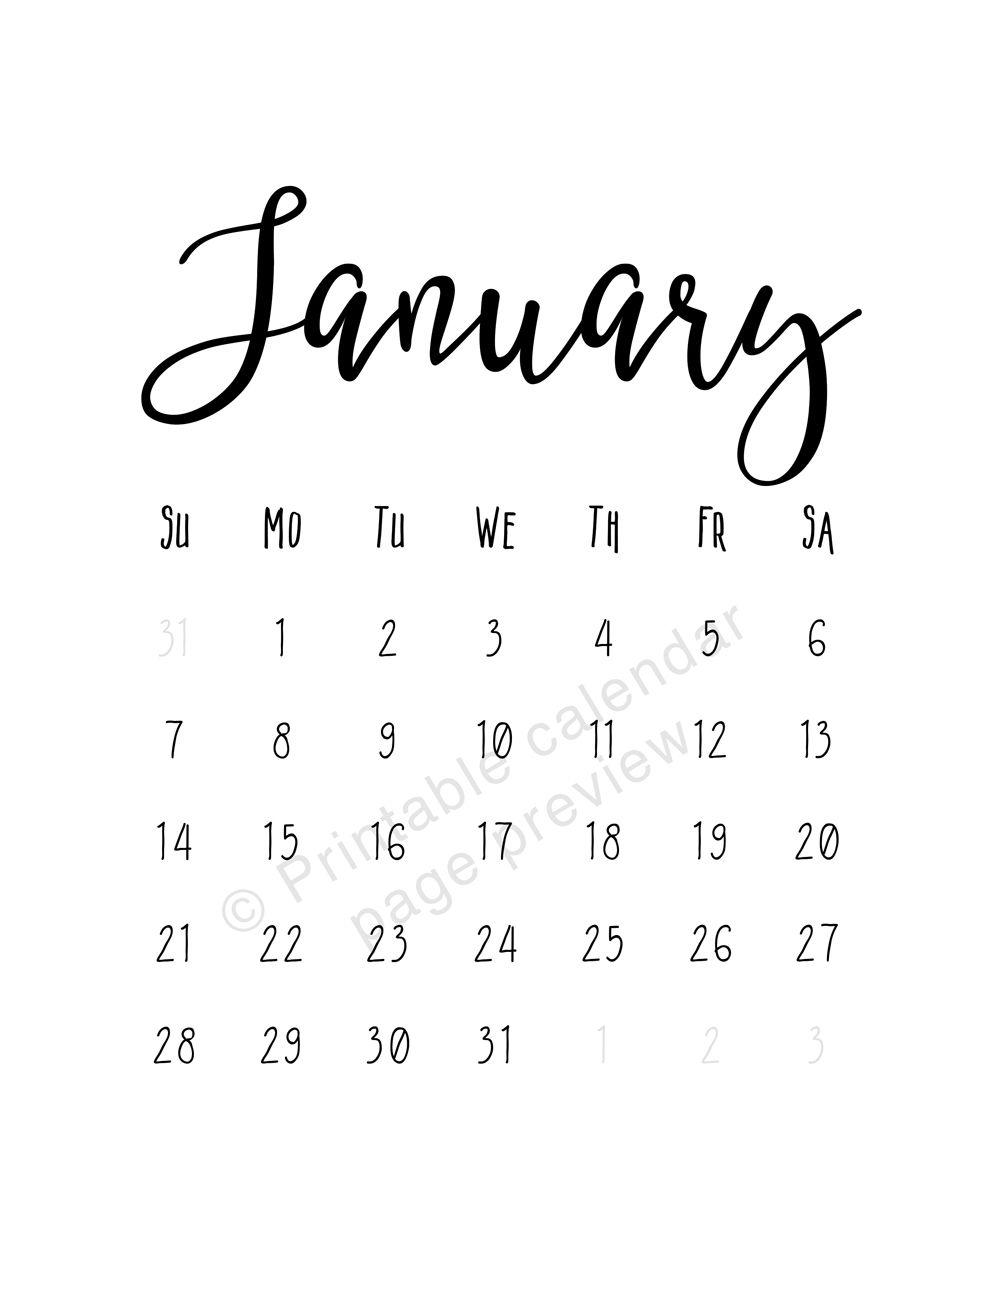 Funny Jan 2019 Calendars